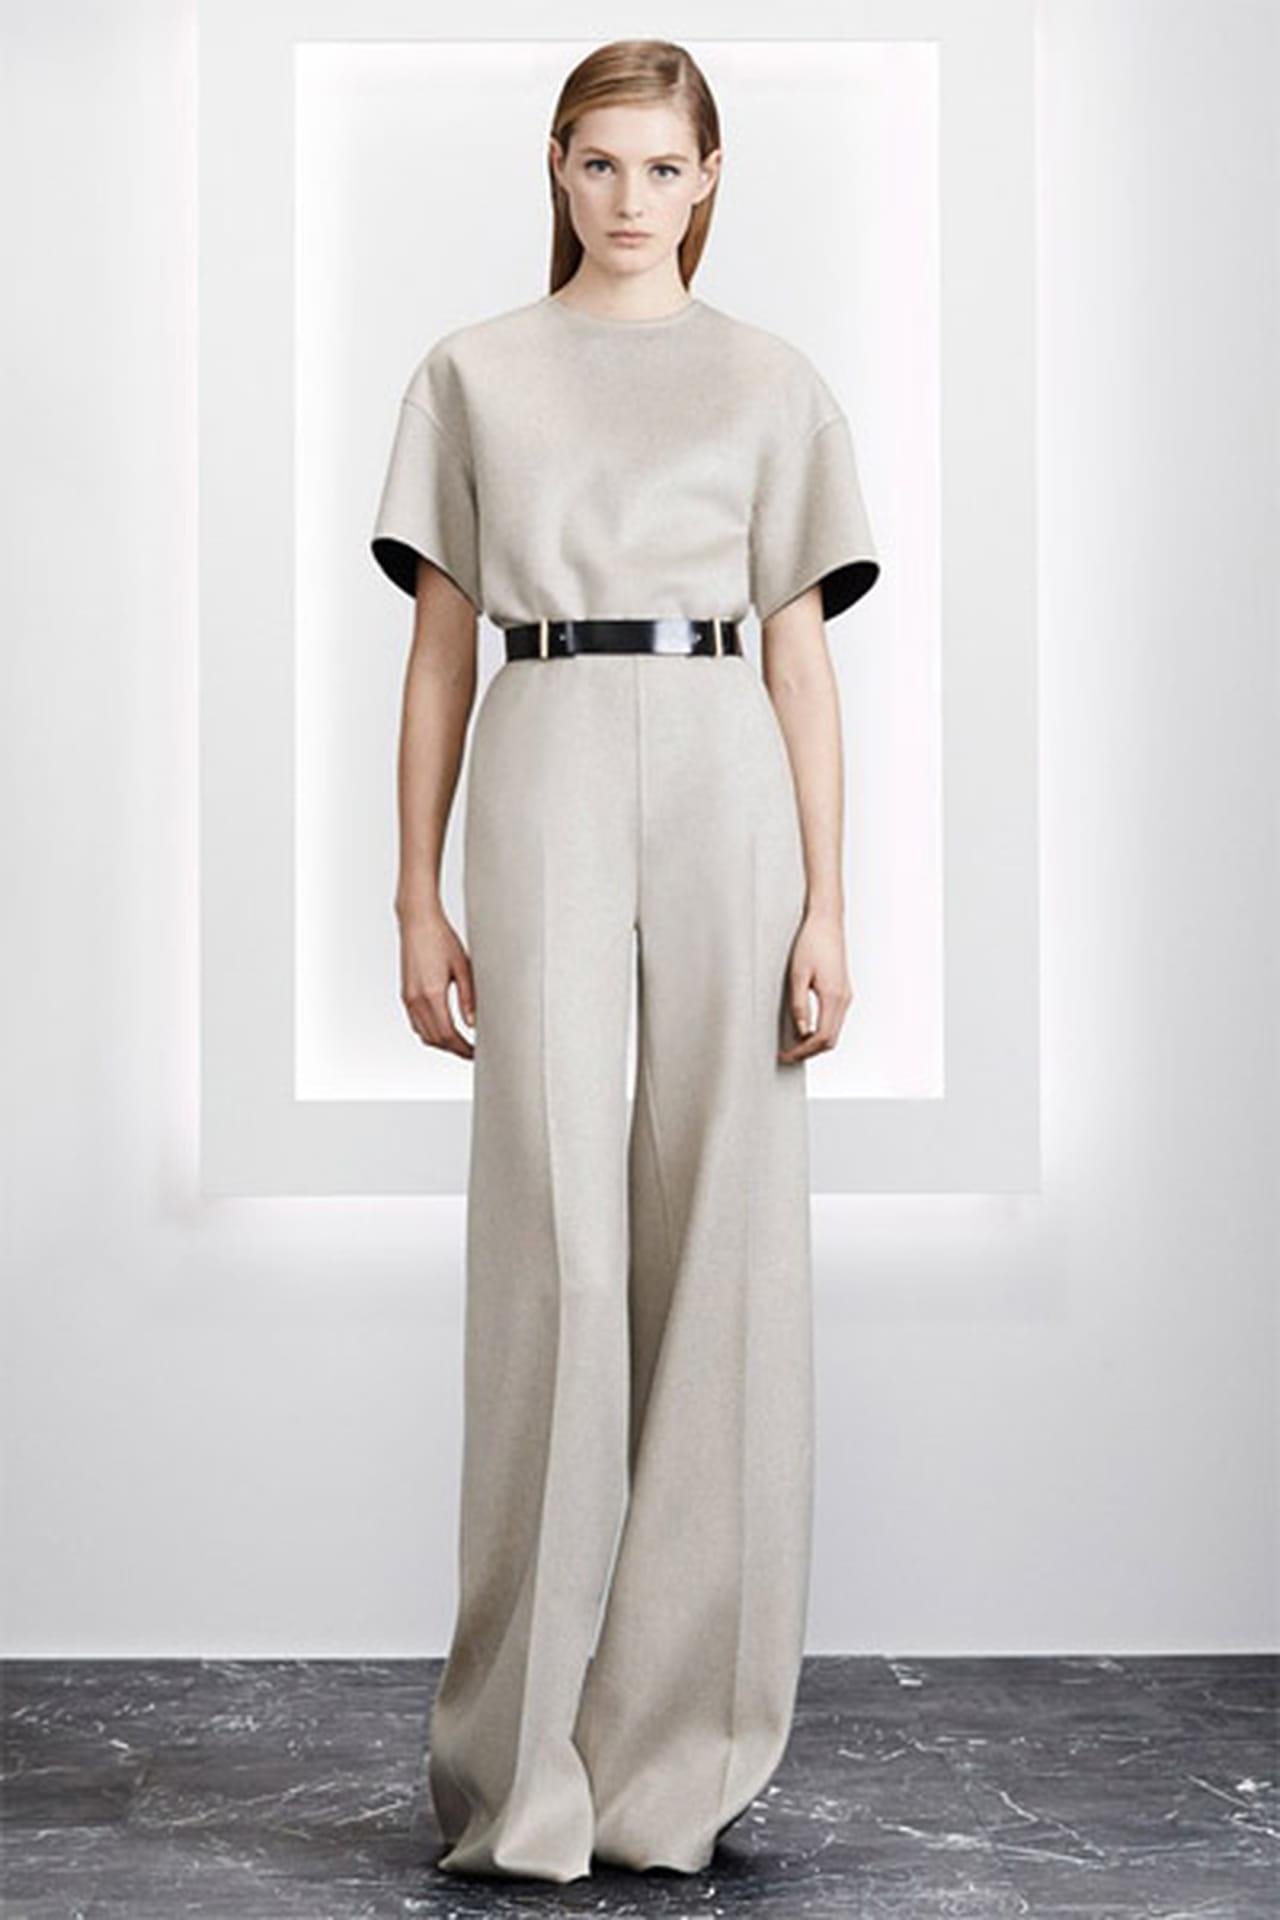 ac27779d1a65a أجدد موديلات الجمبسوت Jumpsuit من أزياء ما قبل خريف 2015